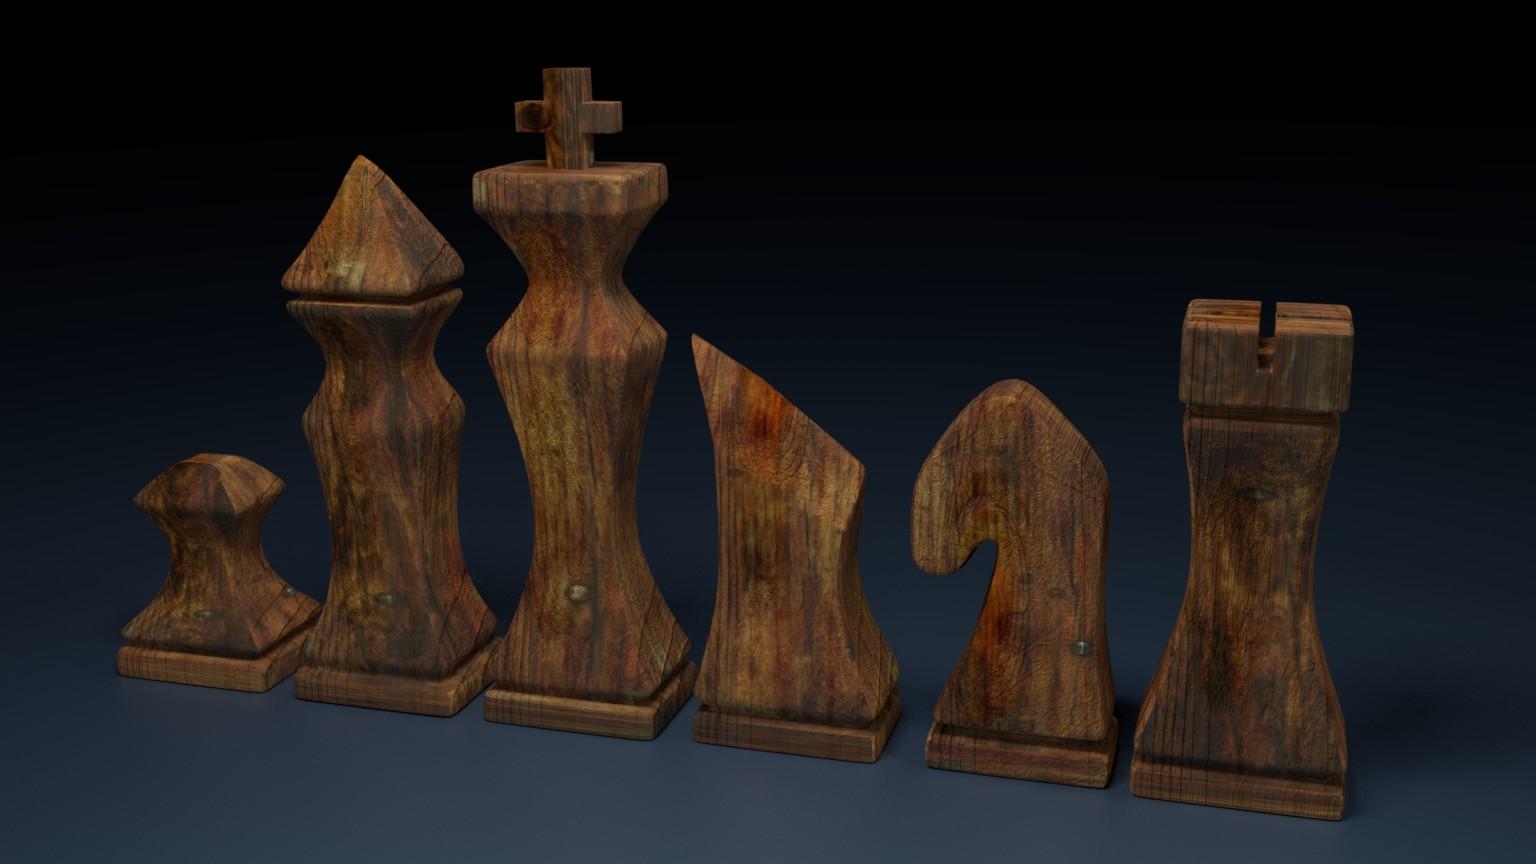 Piezas y tableros de ajedrez-ajedrez_viejo.jpg